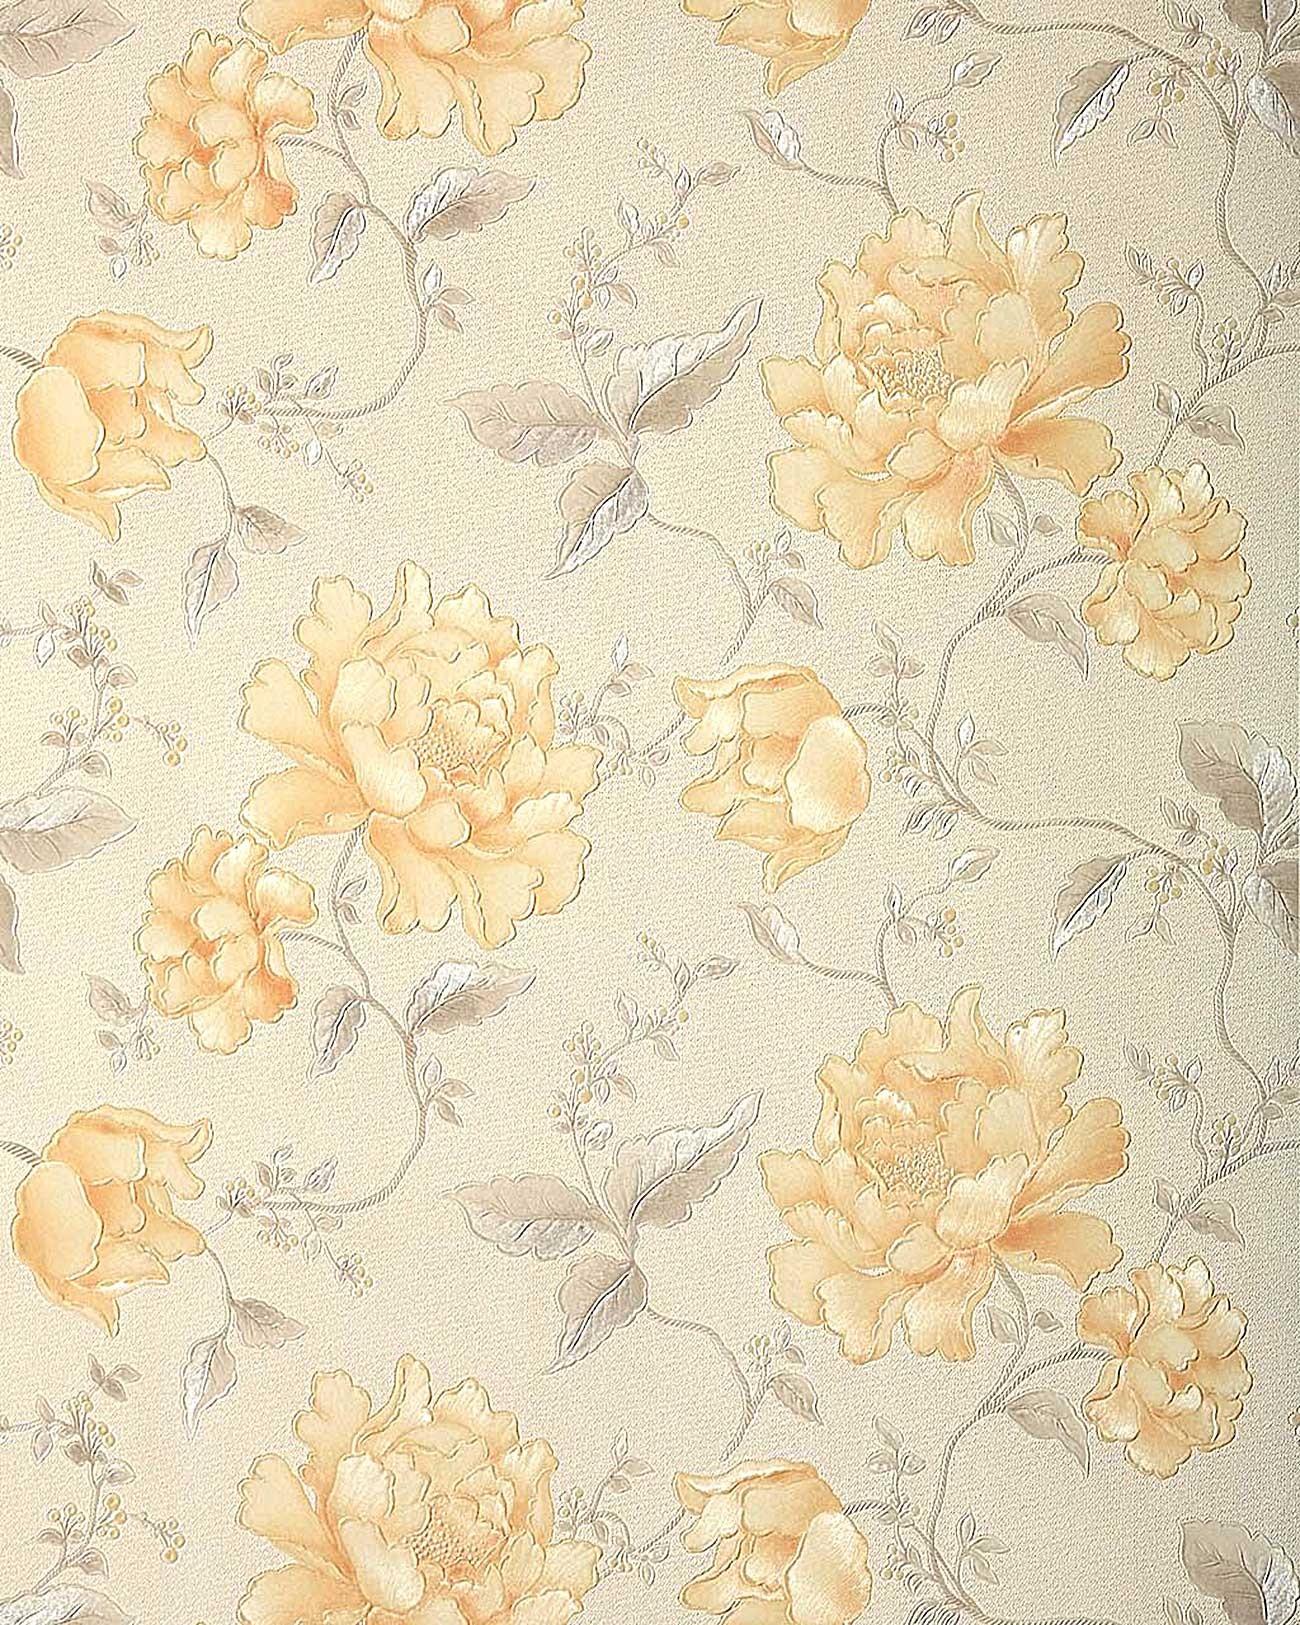 Papel pintado de flores edem 748 30 3d textura in relieve for Papel con relieve para pared